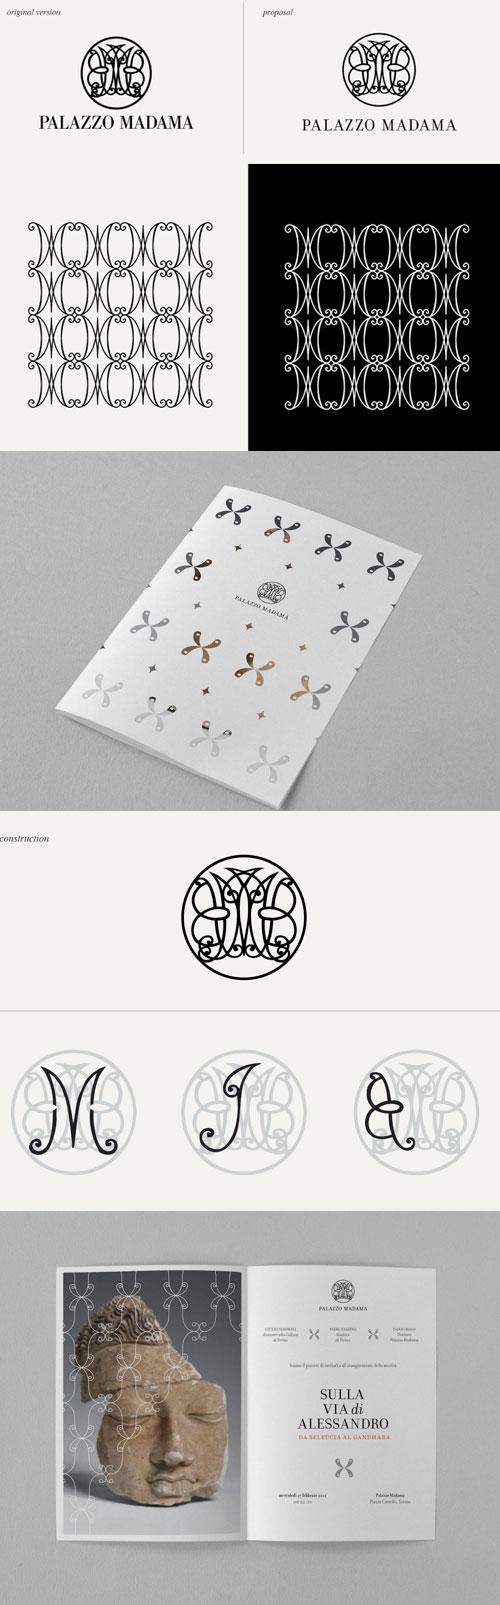 corporate_identity_design_8